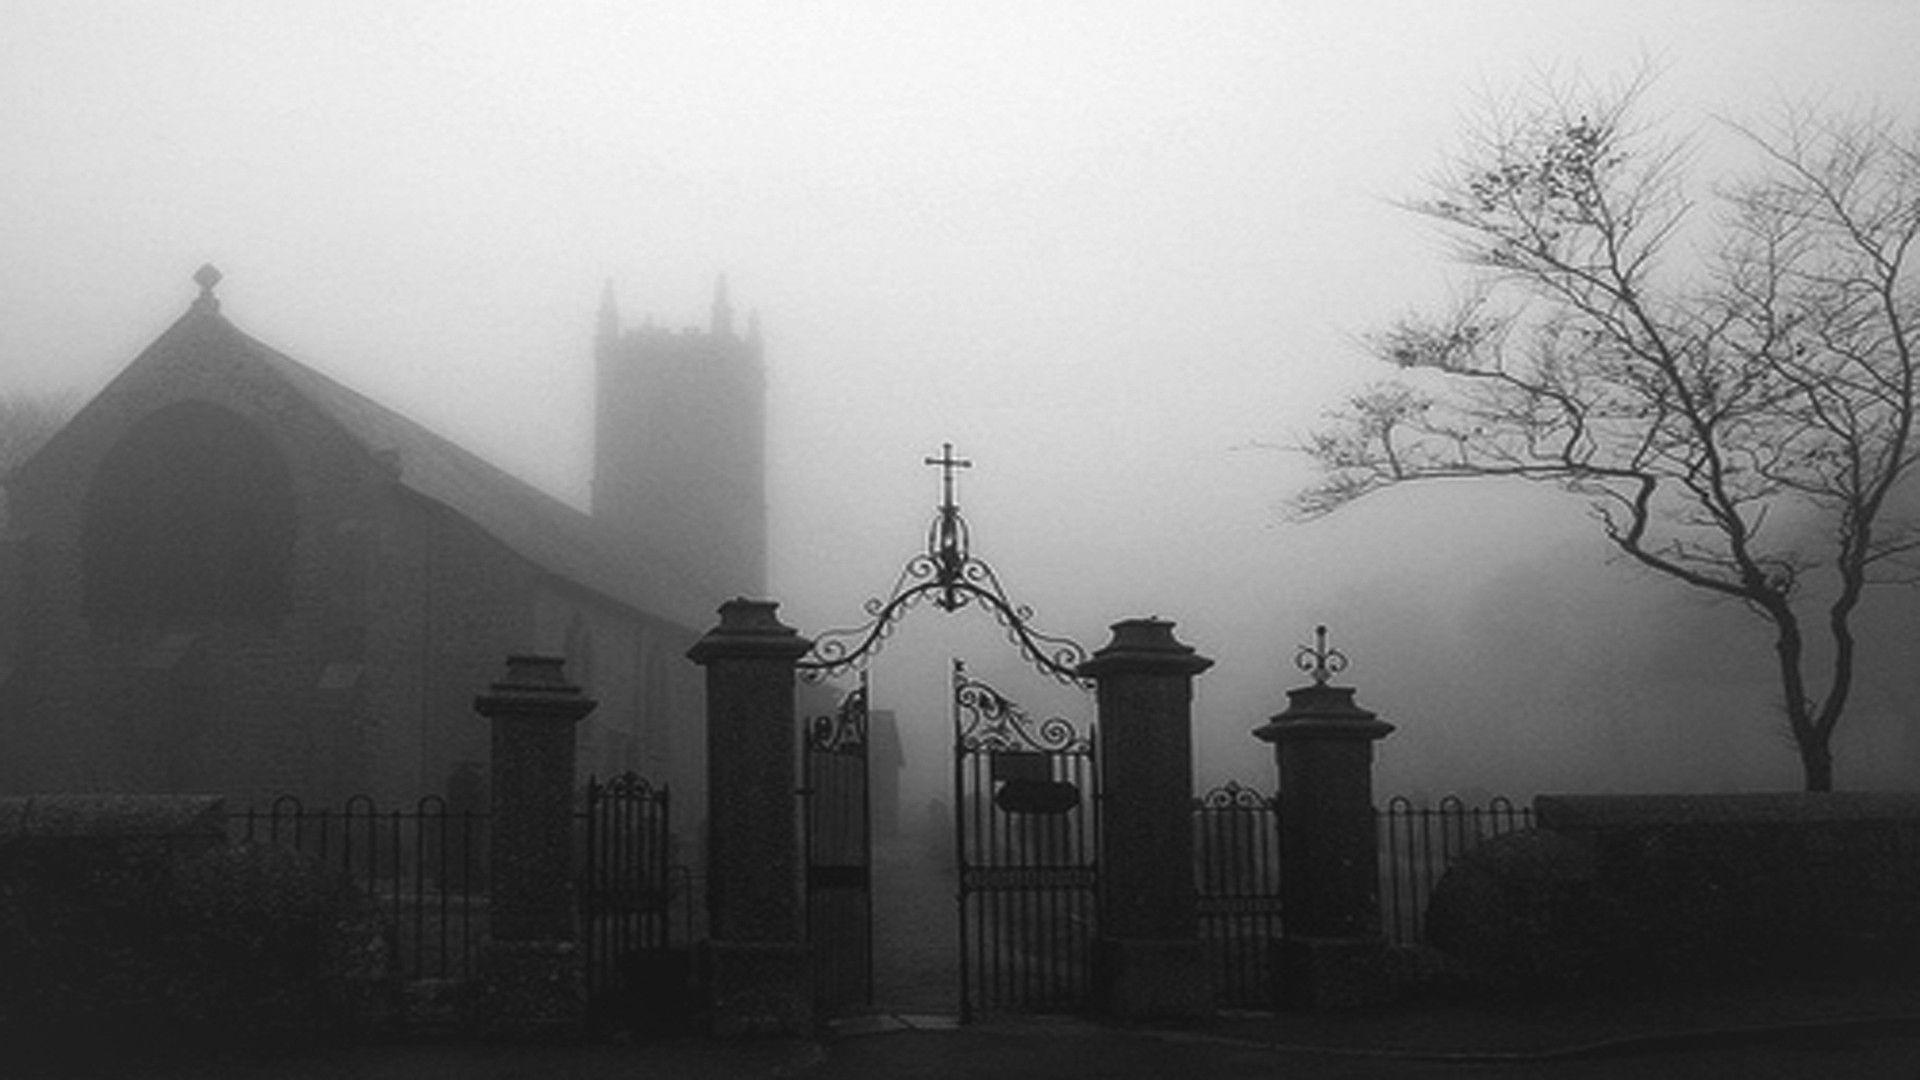 The graveyard mystery| short story